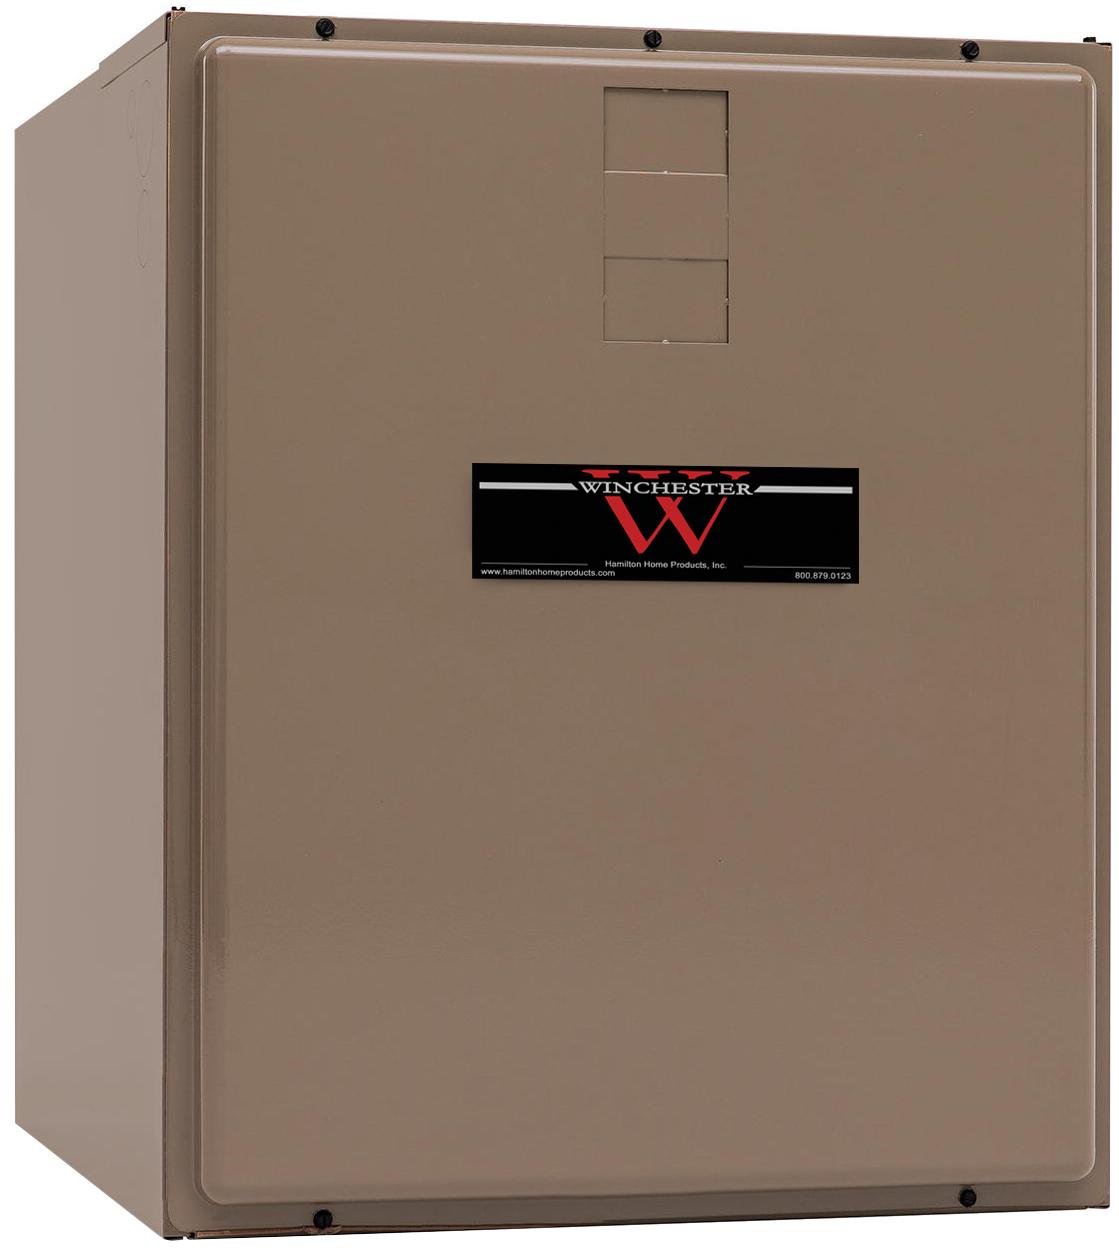 Winchester Multi-Positional Air Handler / Electric Furnace ... on garage wiring layout, garage heater specifications, garage heater regulator, garage heater forum, garage heater parts, garage heater exhaust, garage heater installation, garage heater accessories, garage heater controls, garage heater transformer,